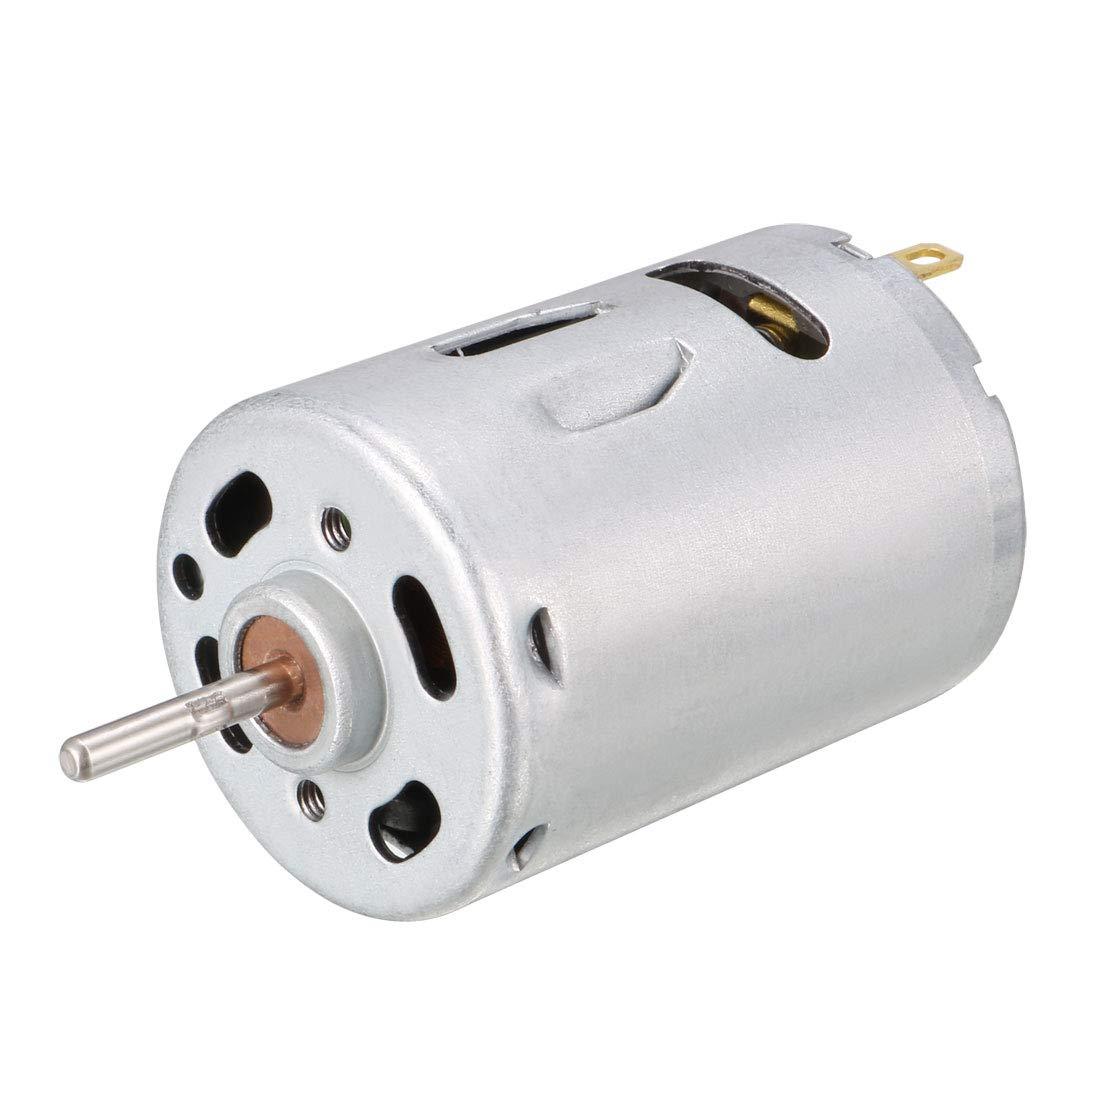 TOPINCN Micro Gear Motor High Torque DC 12V 400RPM N20 16mm Shaft M4x55mm Screw Reducer Reduction Motor with Gear Box